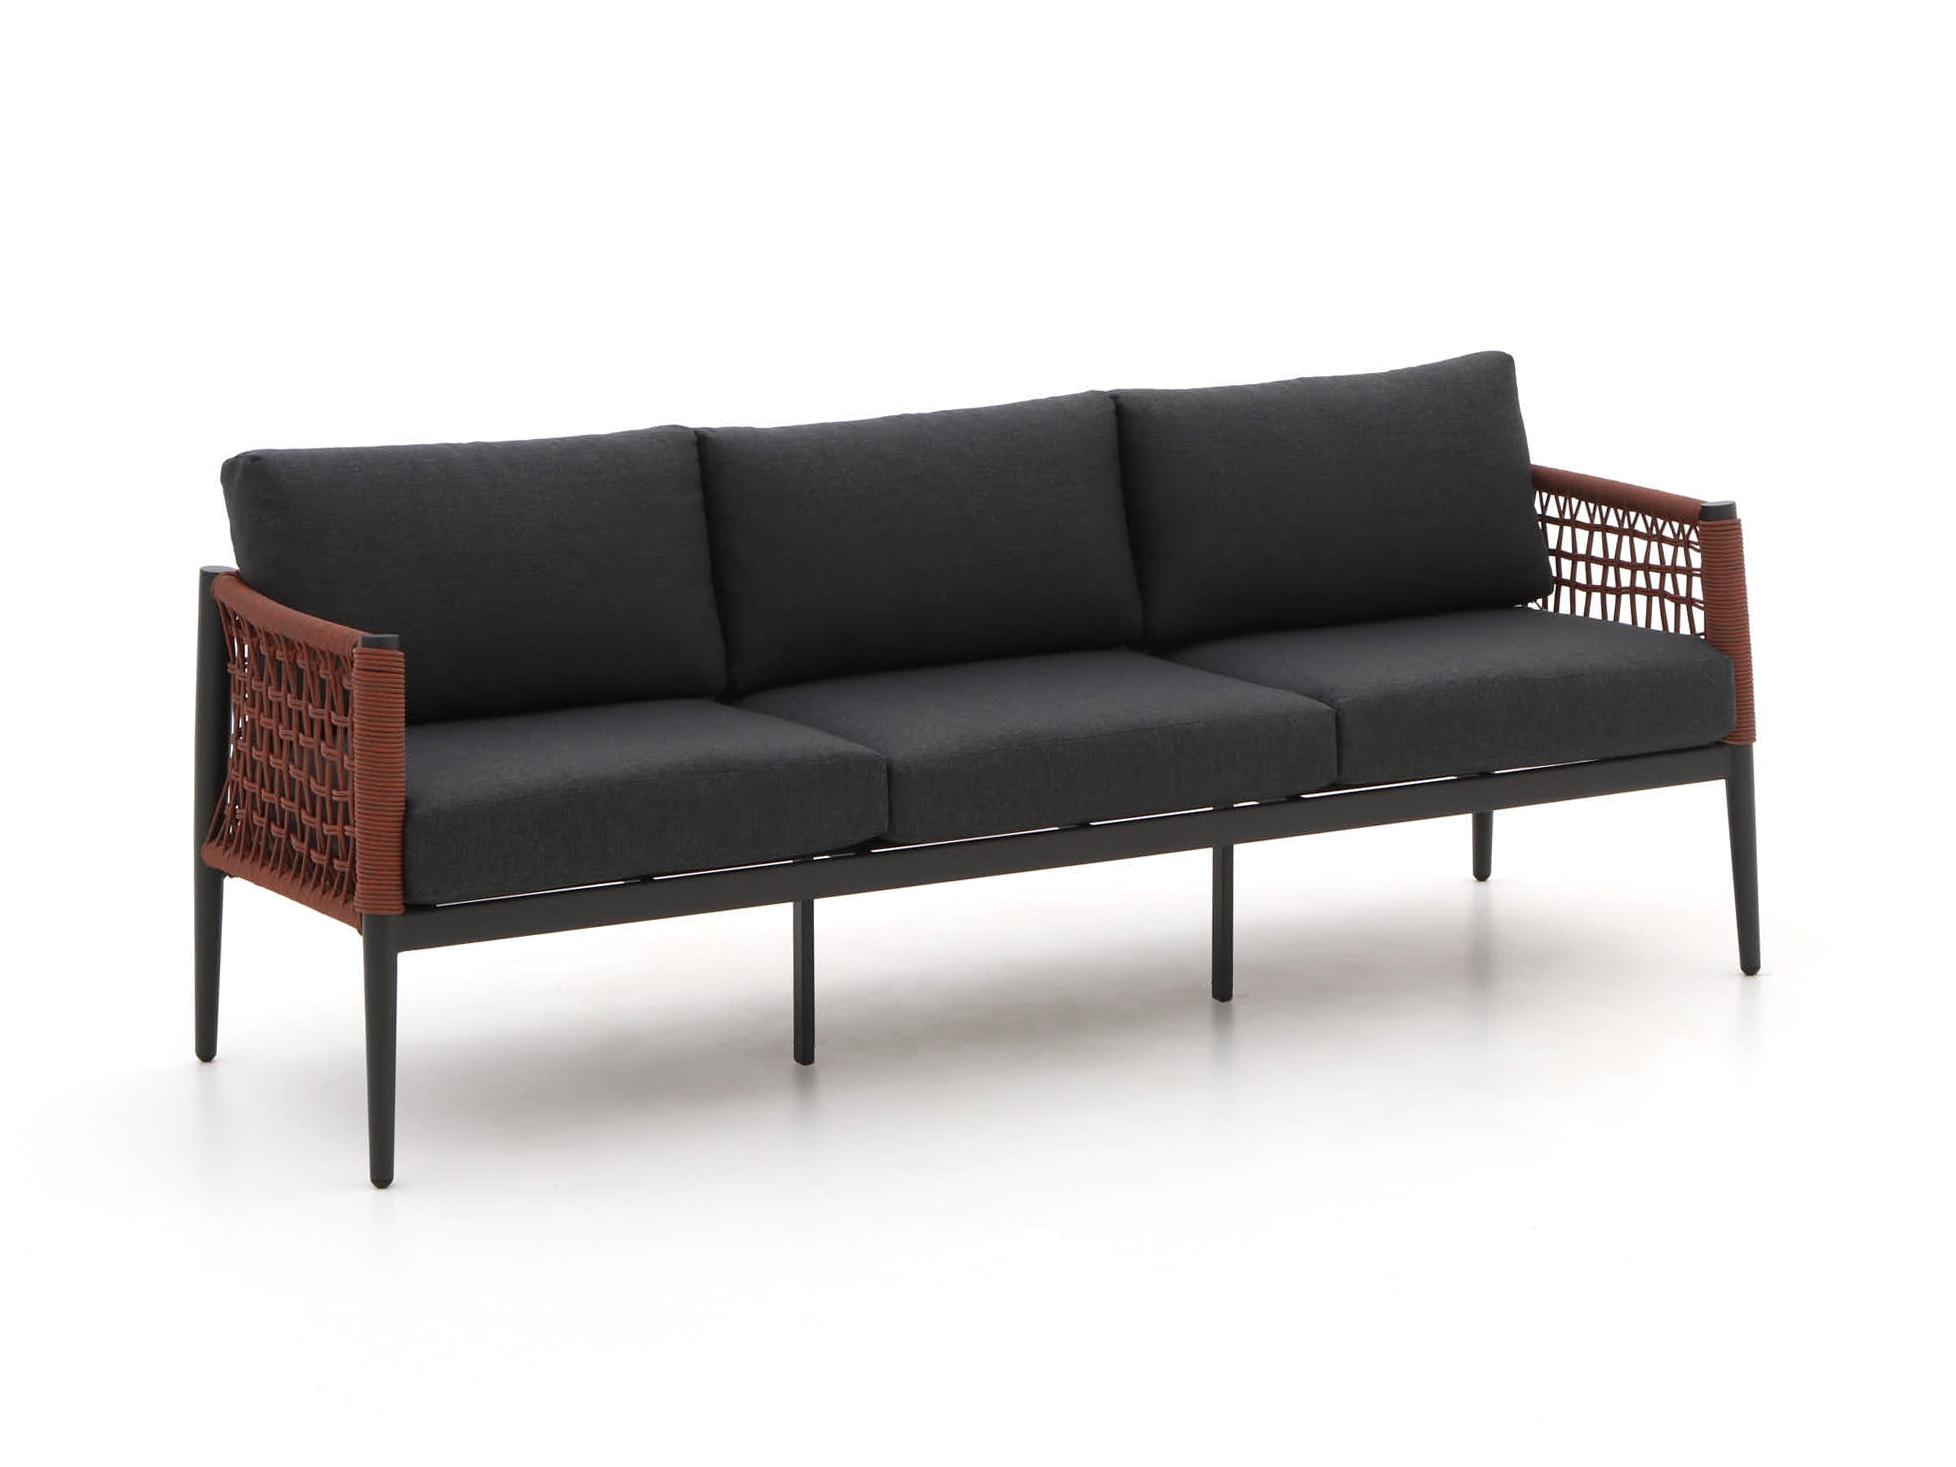 Manifesto Salera lounge tuinbank 3-zits 204cm - Laagste prijsgarantie!